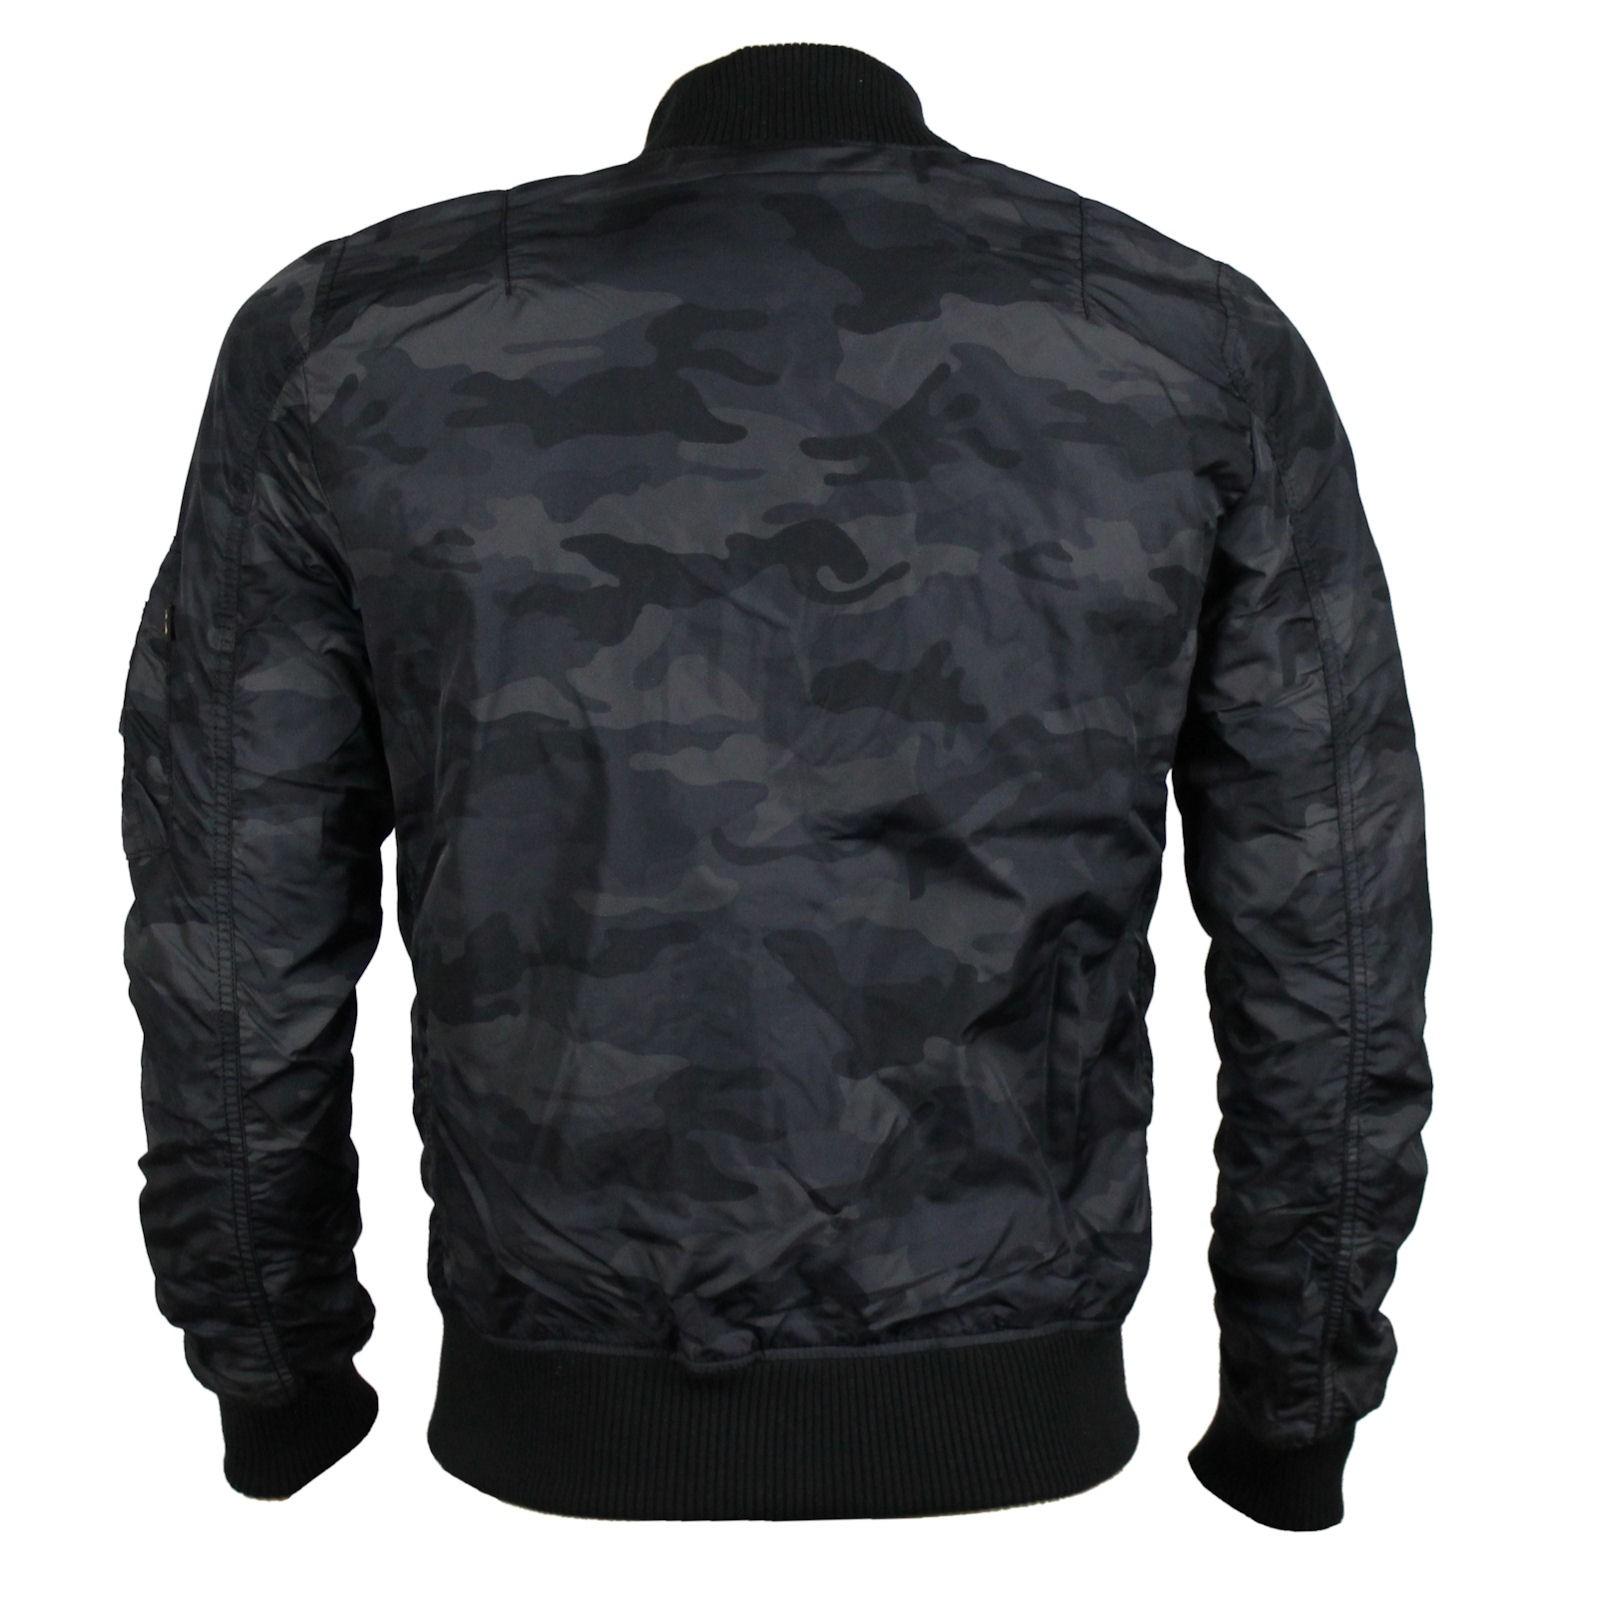 Camouflage jacke schwarz